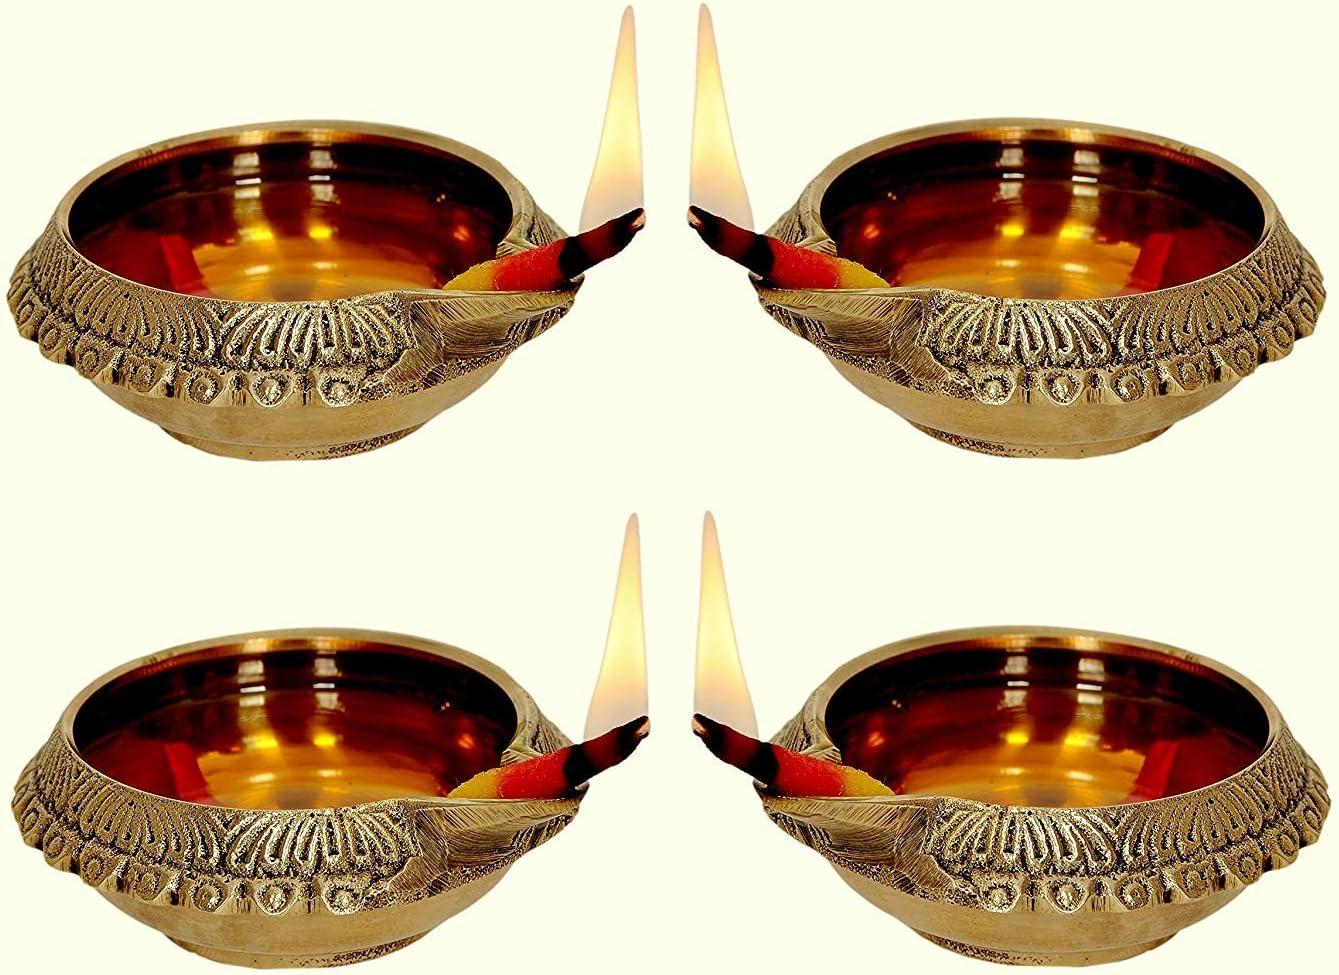 PARIJAT HANDICRAFT Chritmas's Sale Decors Oil/Ghee Lamp Combo (Deepak) in Natural Gold Brass Table Diya Set (Height: 1 inch, Pack of 4)